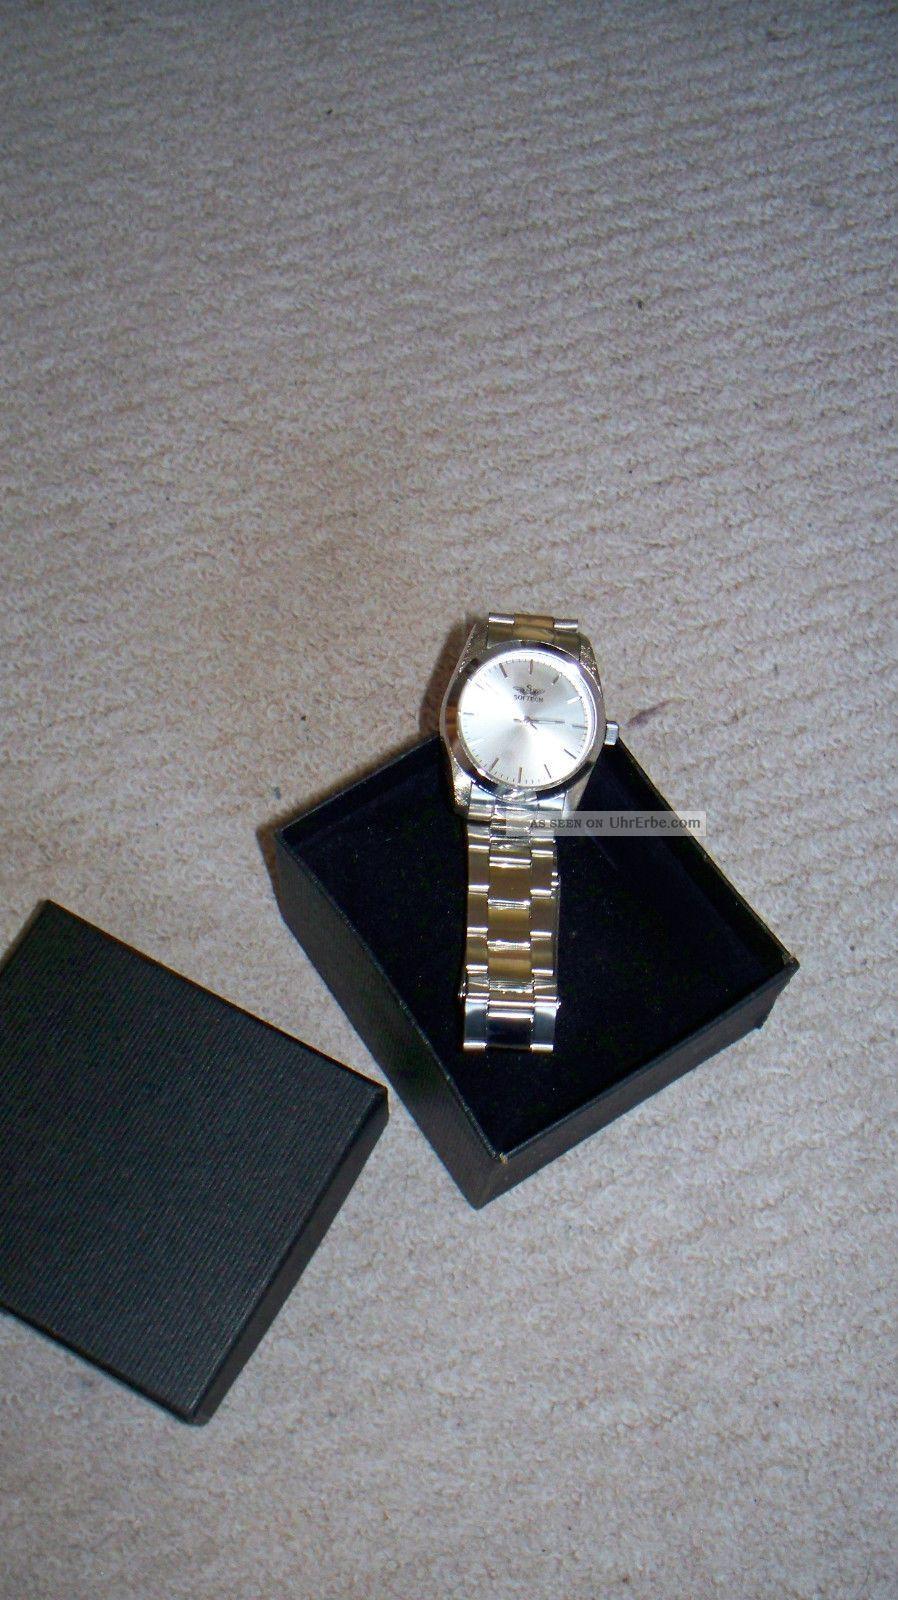 Herren - Armbanduhr Softech London Armbanduhren Bild